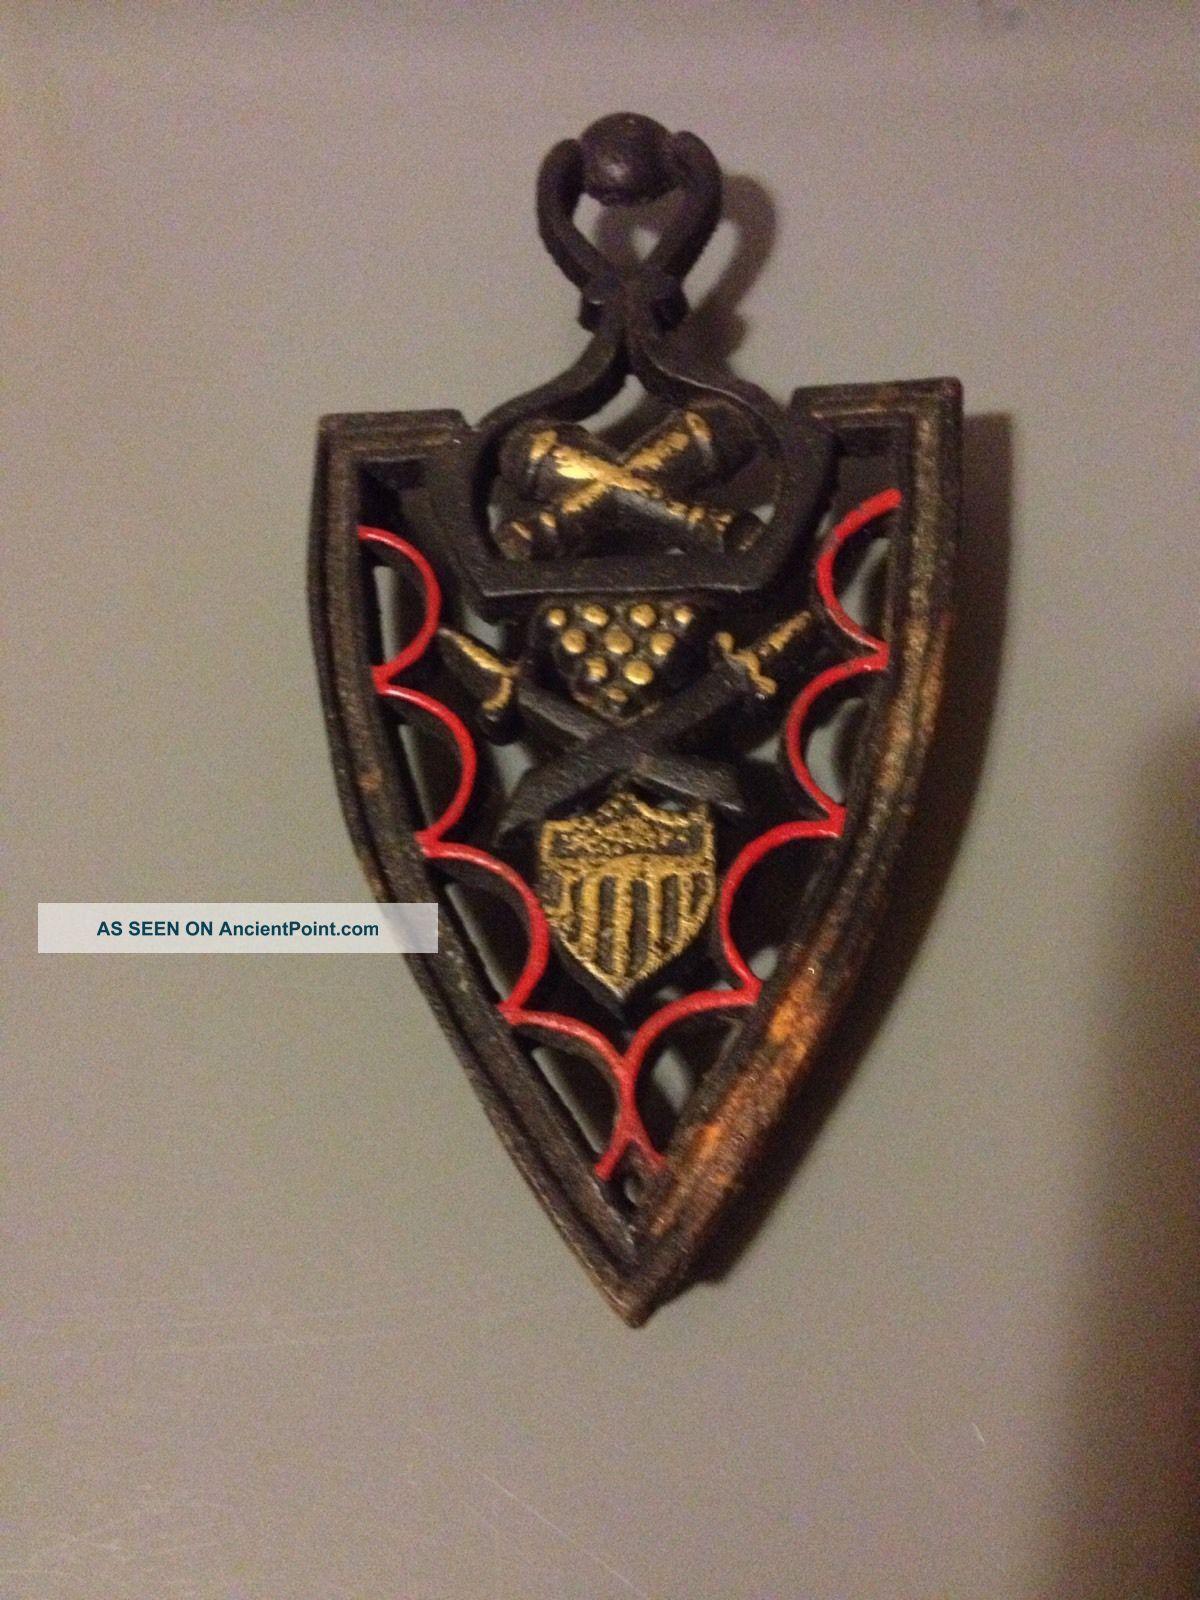 Antique Iron Trivet W/cannon ' S,  Balls,  Swords & A Shield - Very Good Cond. Trivets photo